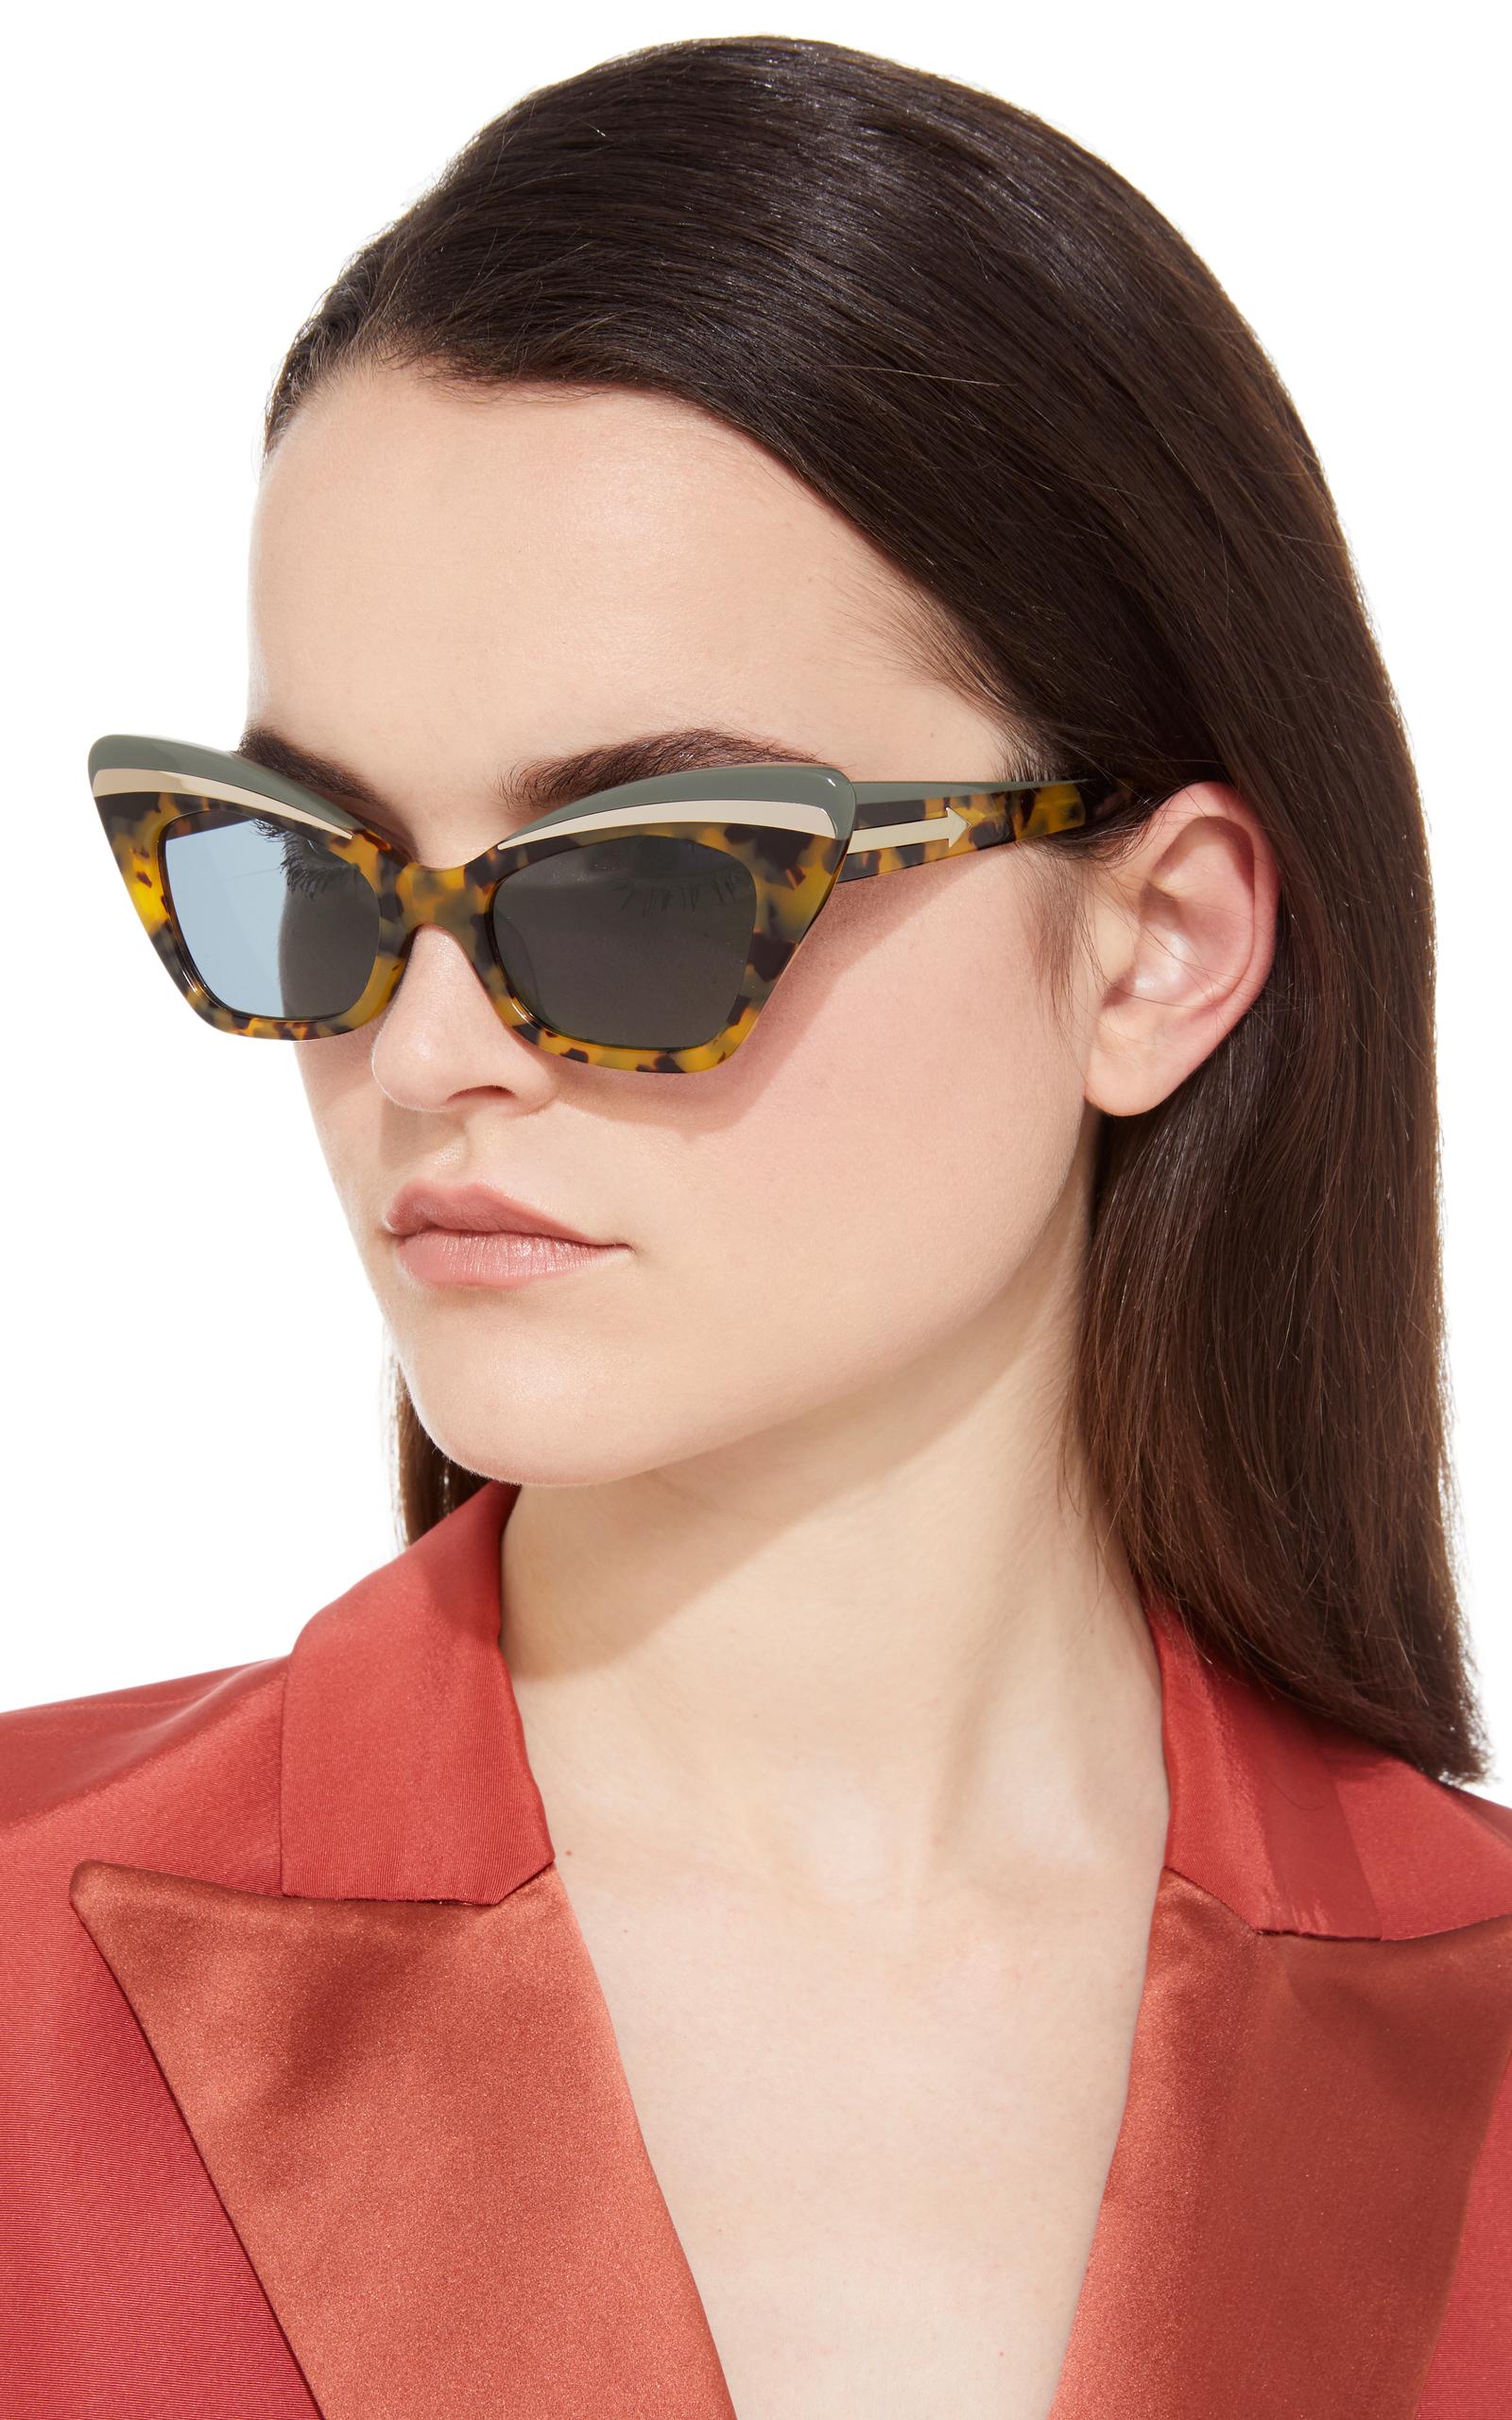 Babou Black Cat-Eye Acetate and Metal Sunglasses Karen Walker vjessoc